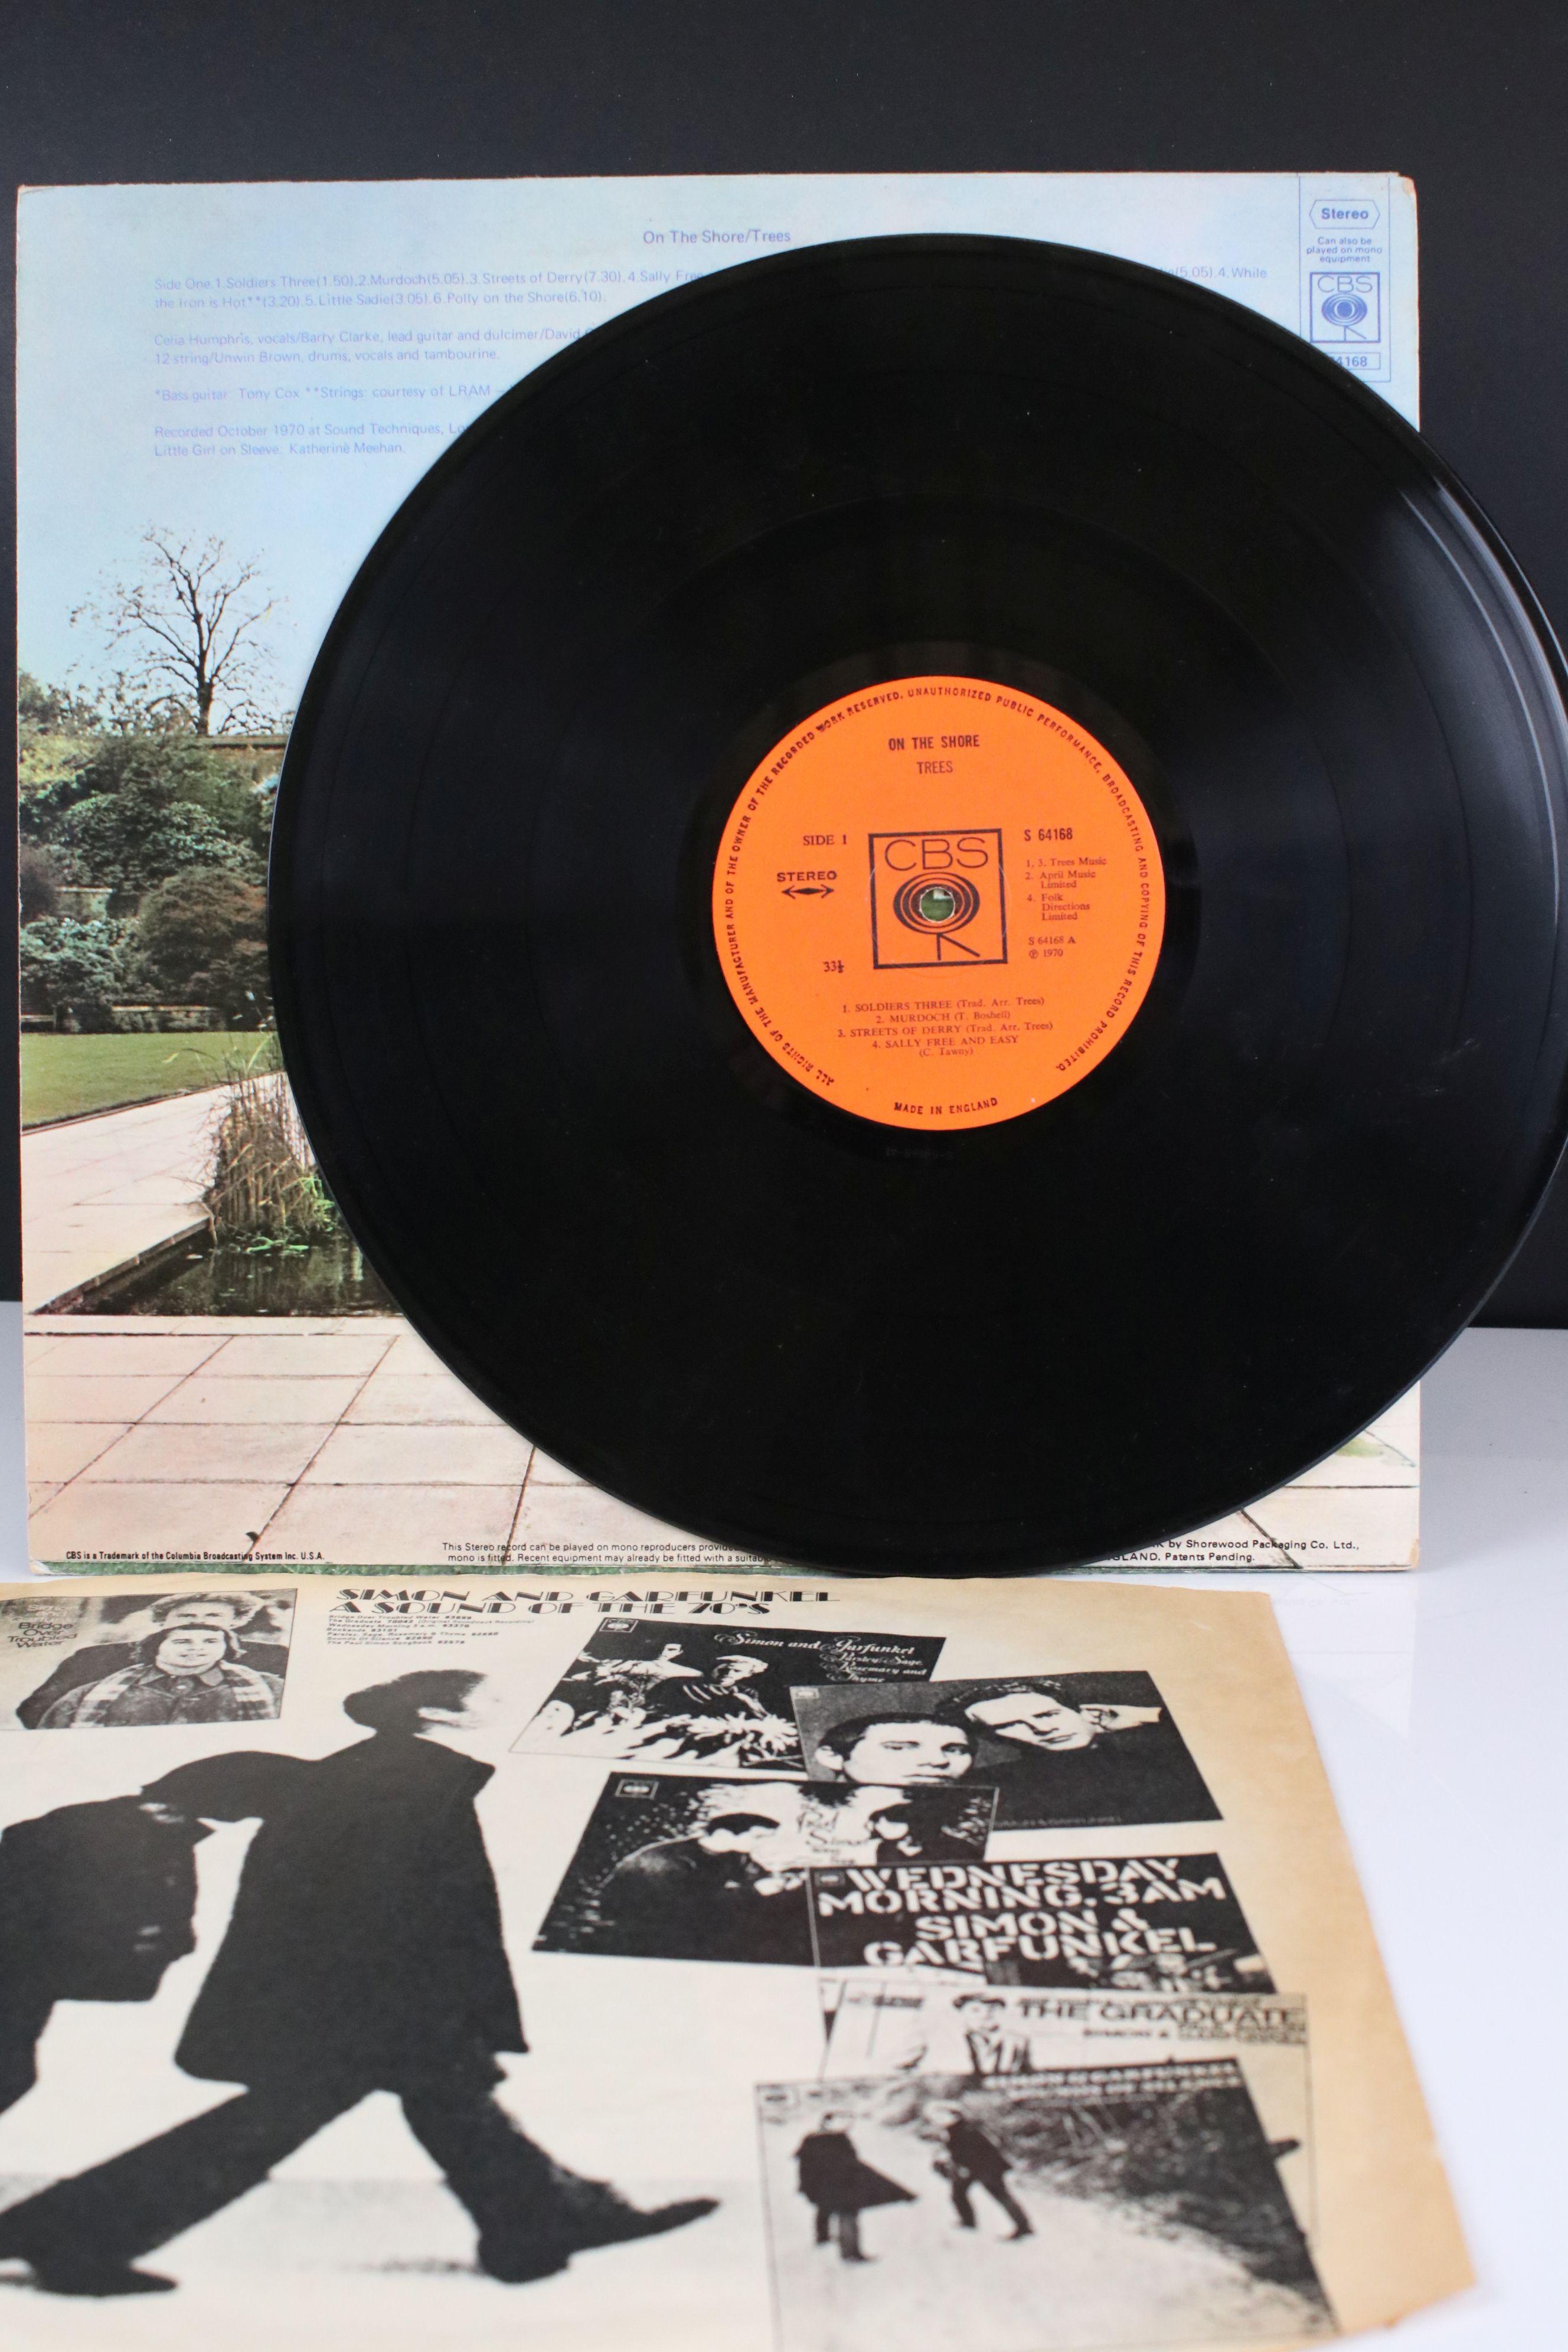 Vinyl - Trees On The Shore LP on CBS 64168 Stereo, vg+ - Image 2 of 4